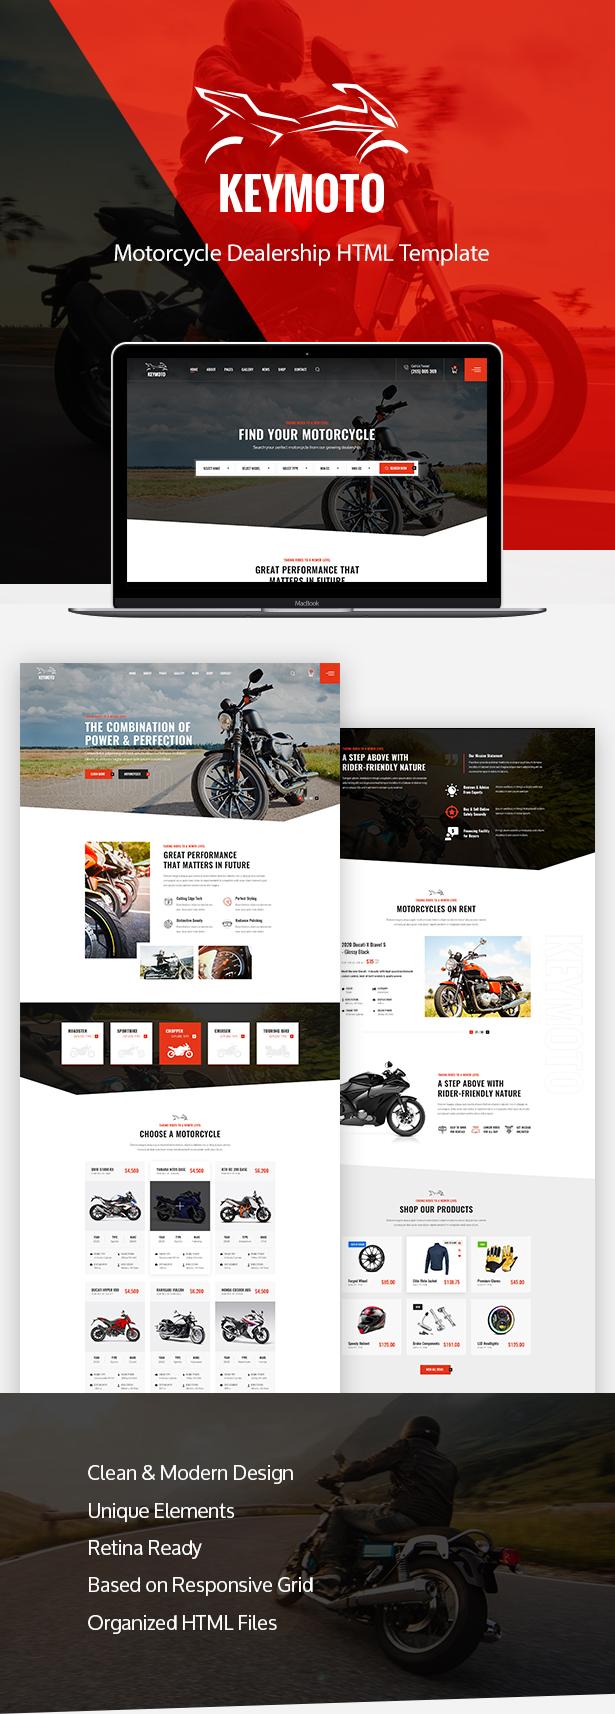 Keymoto - Motorcycle HTML Template - 1